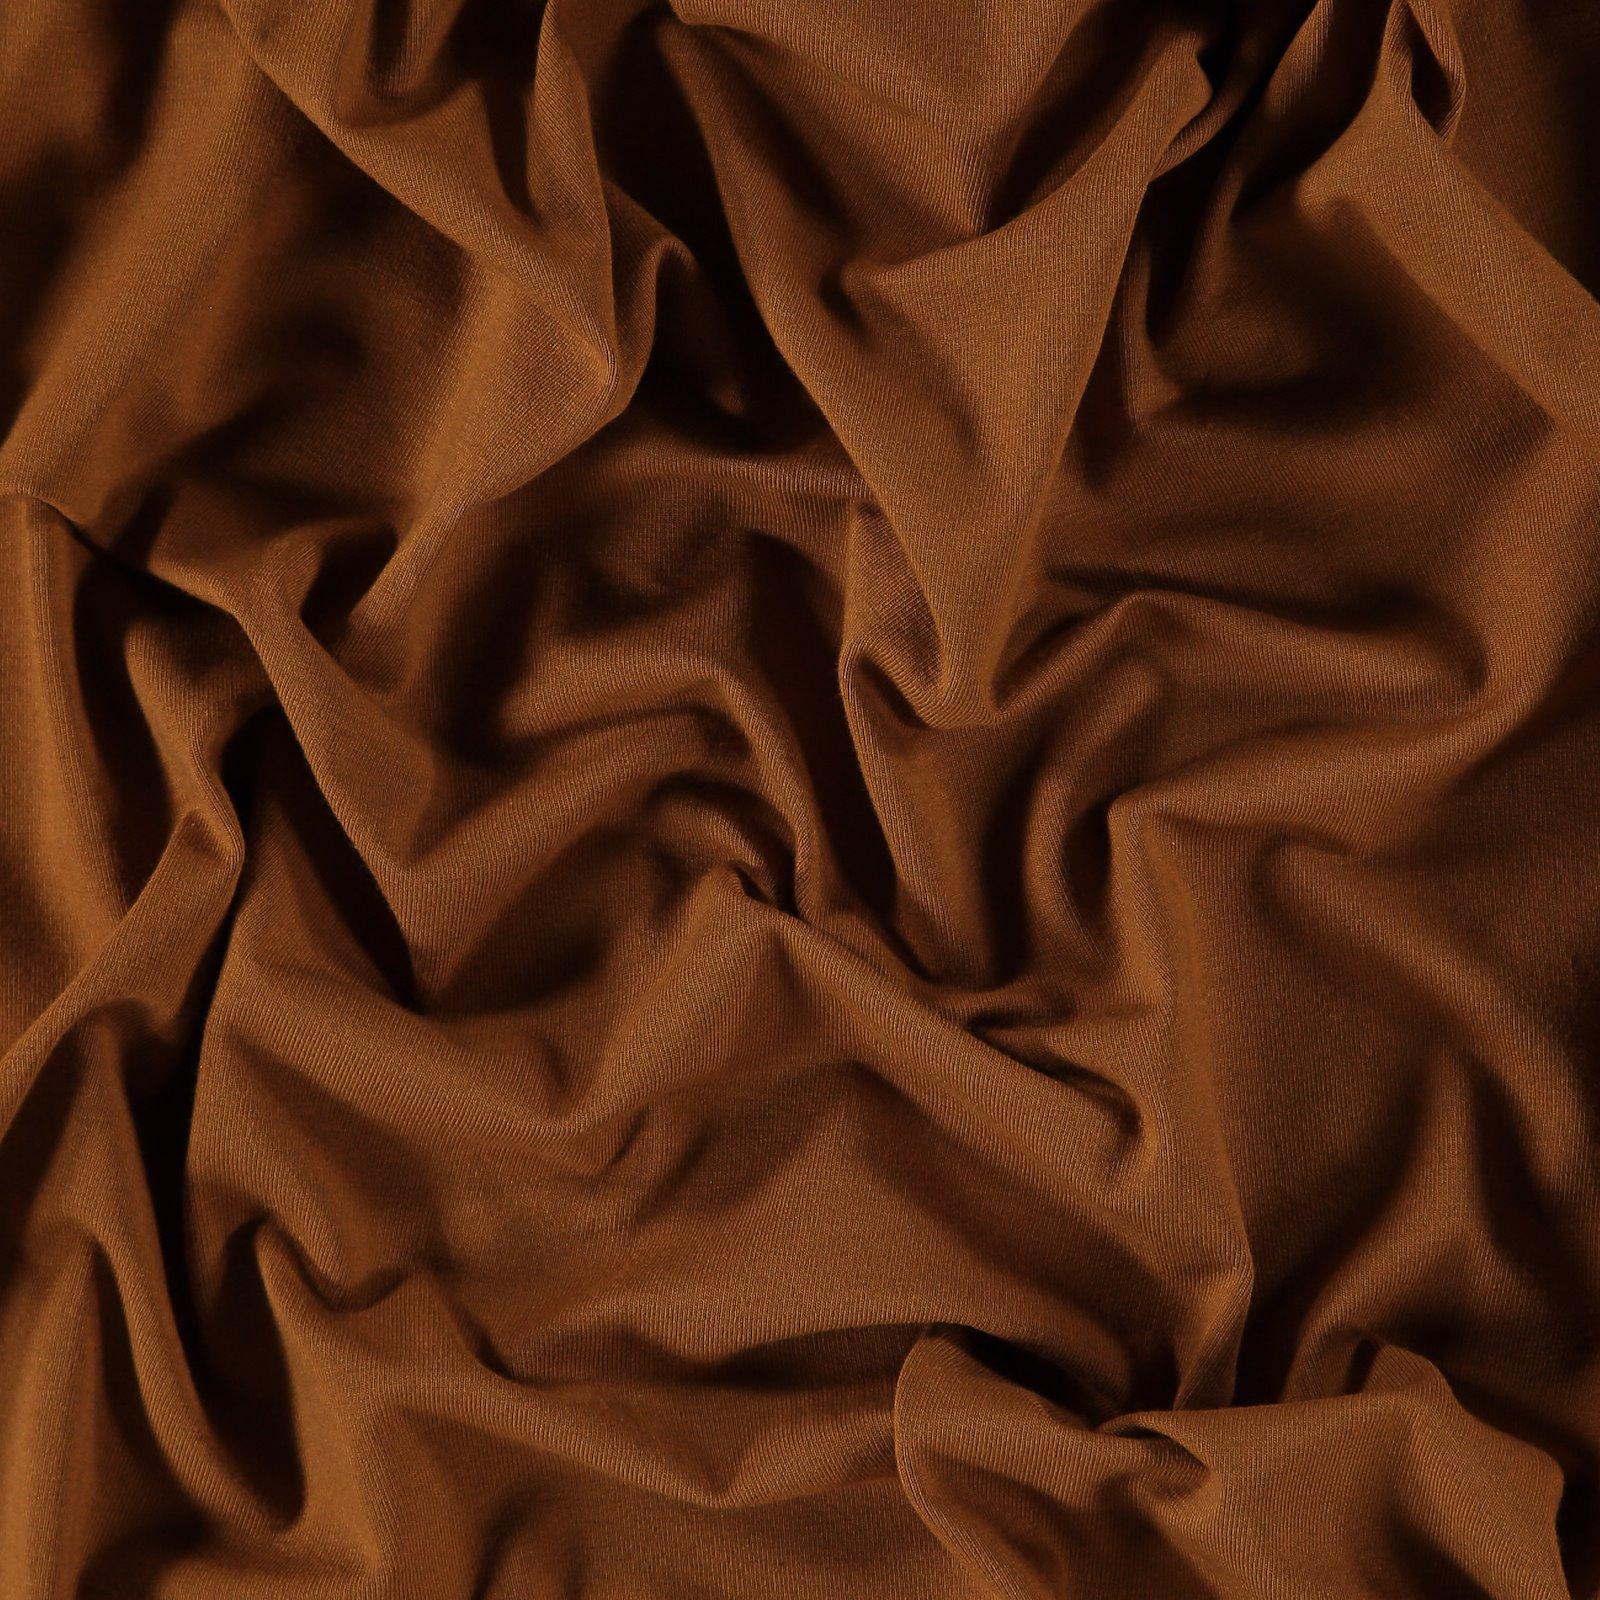 Organic stretch jersey dark caramel 272655_pack